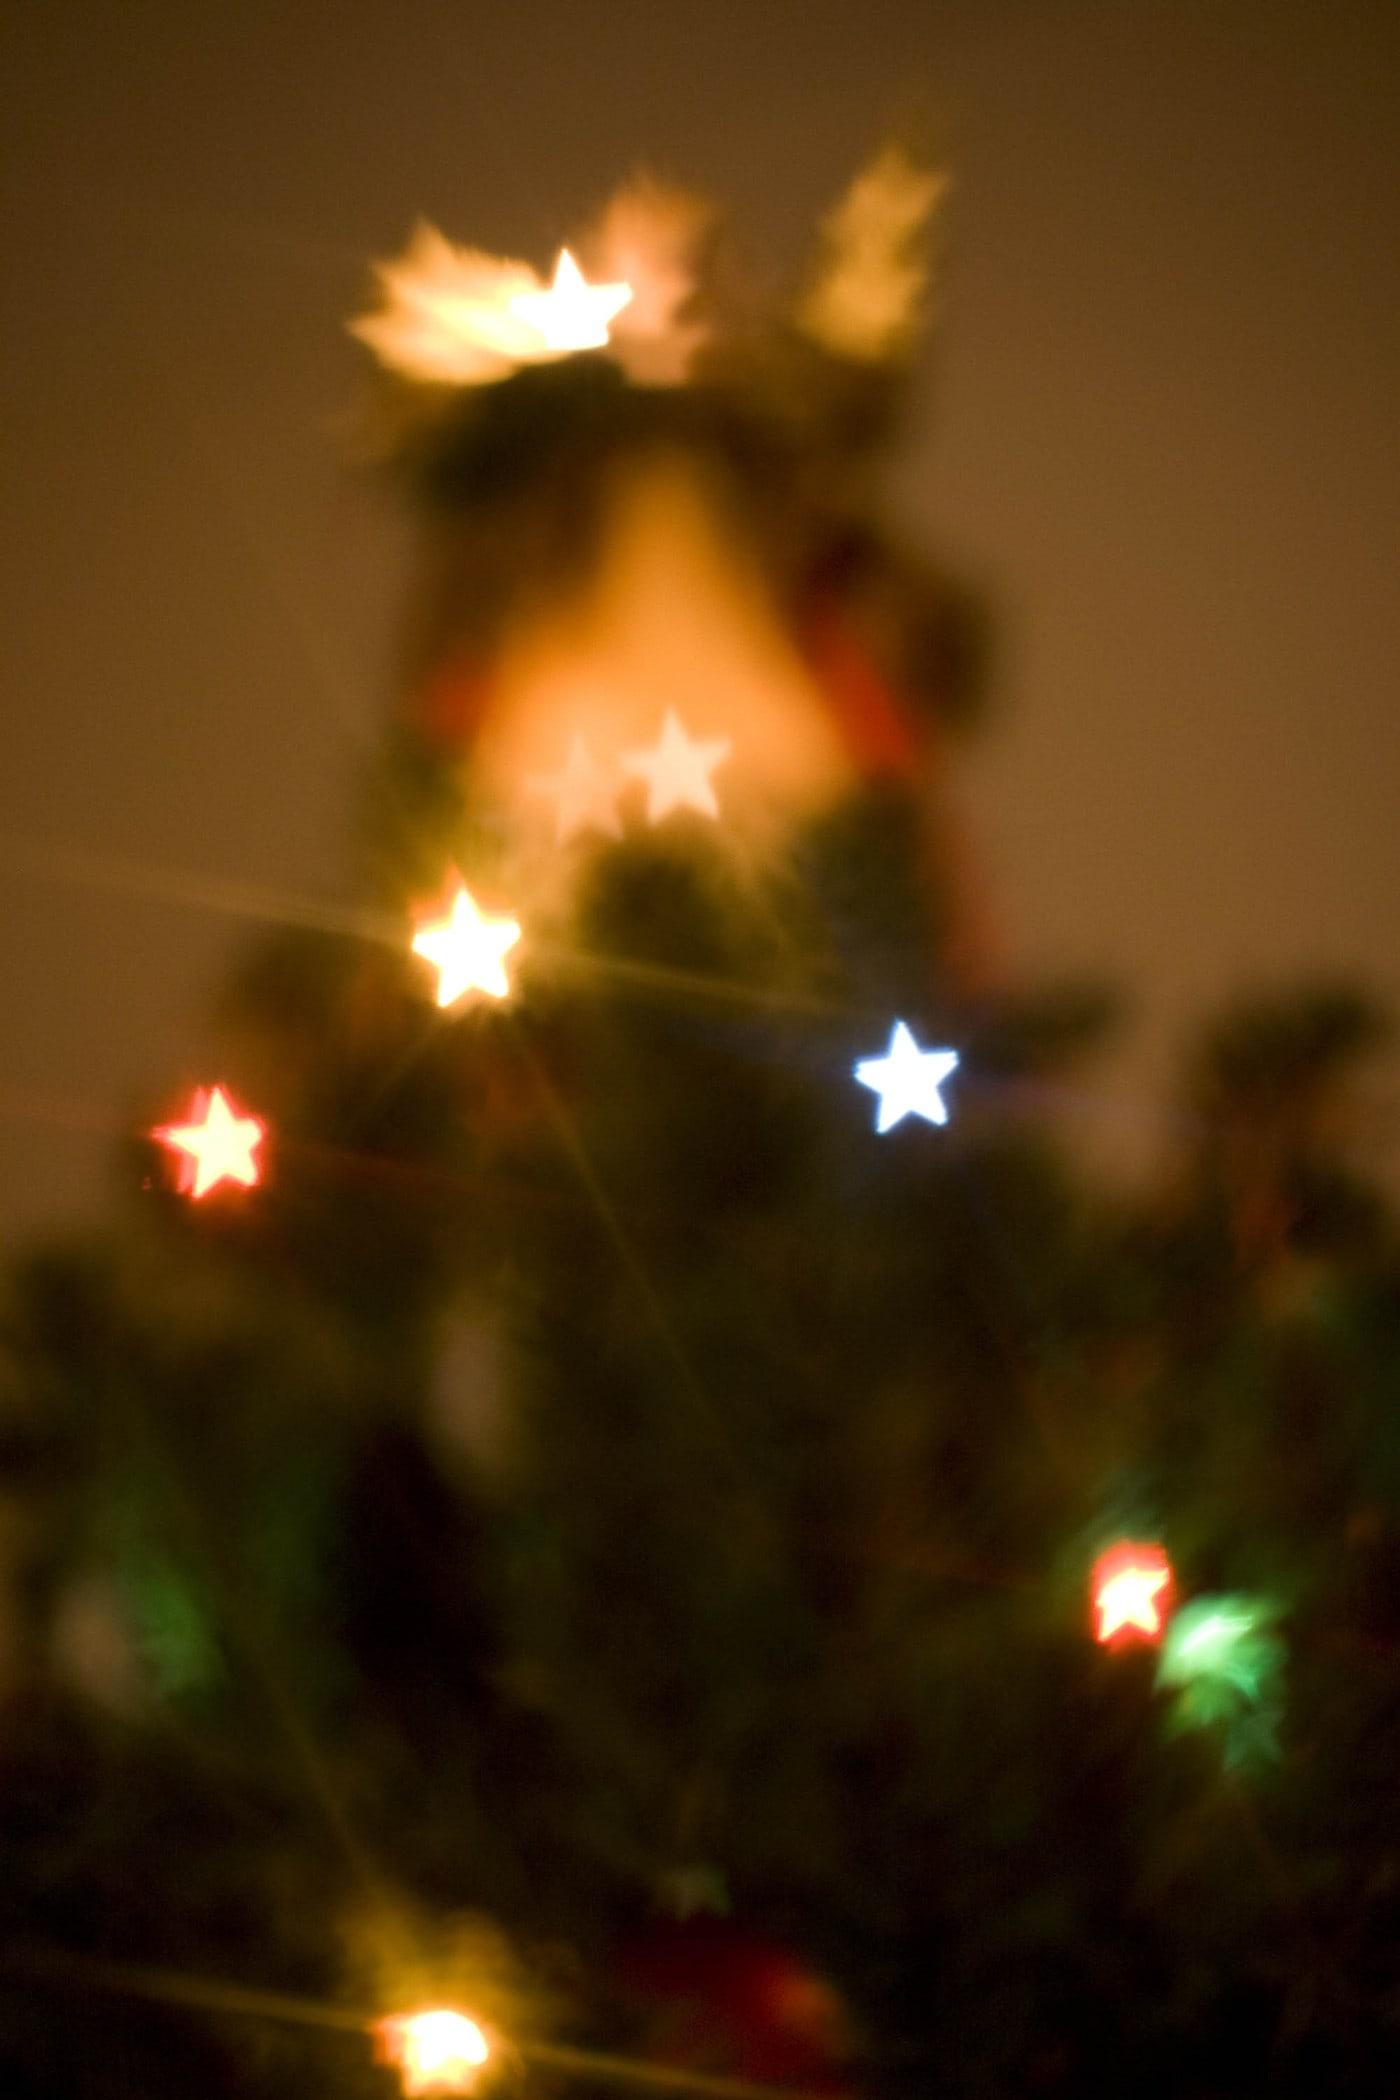 Christmas tree photos with a homemade bokeh star lens